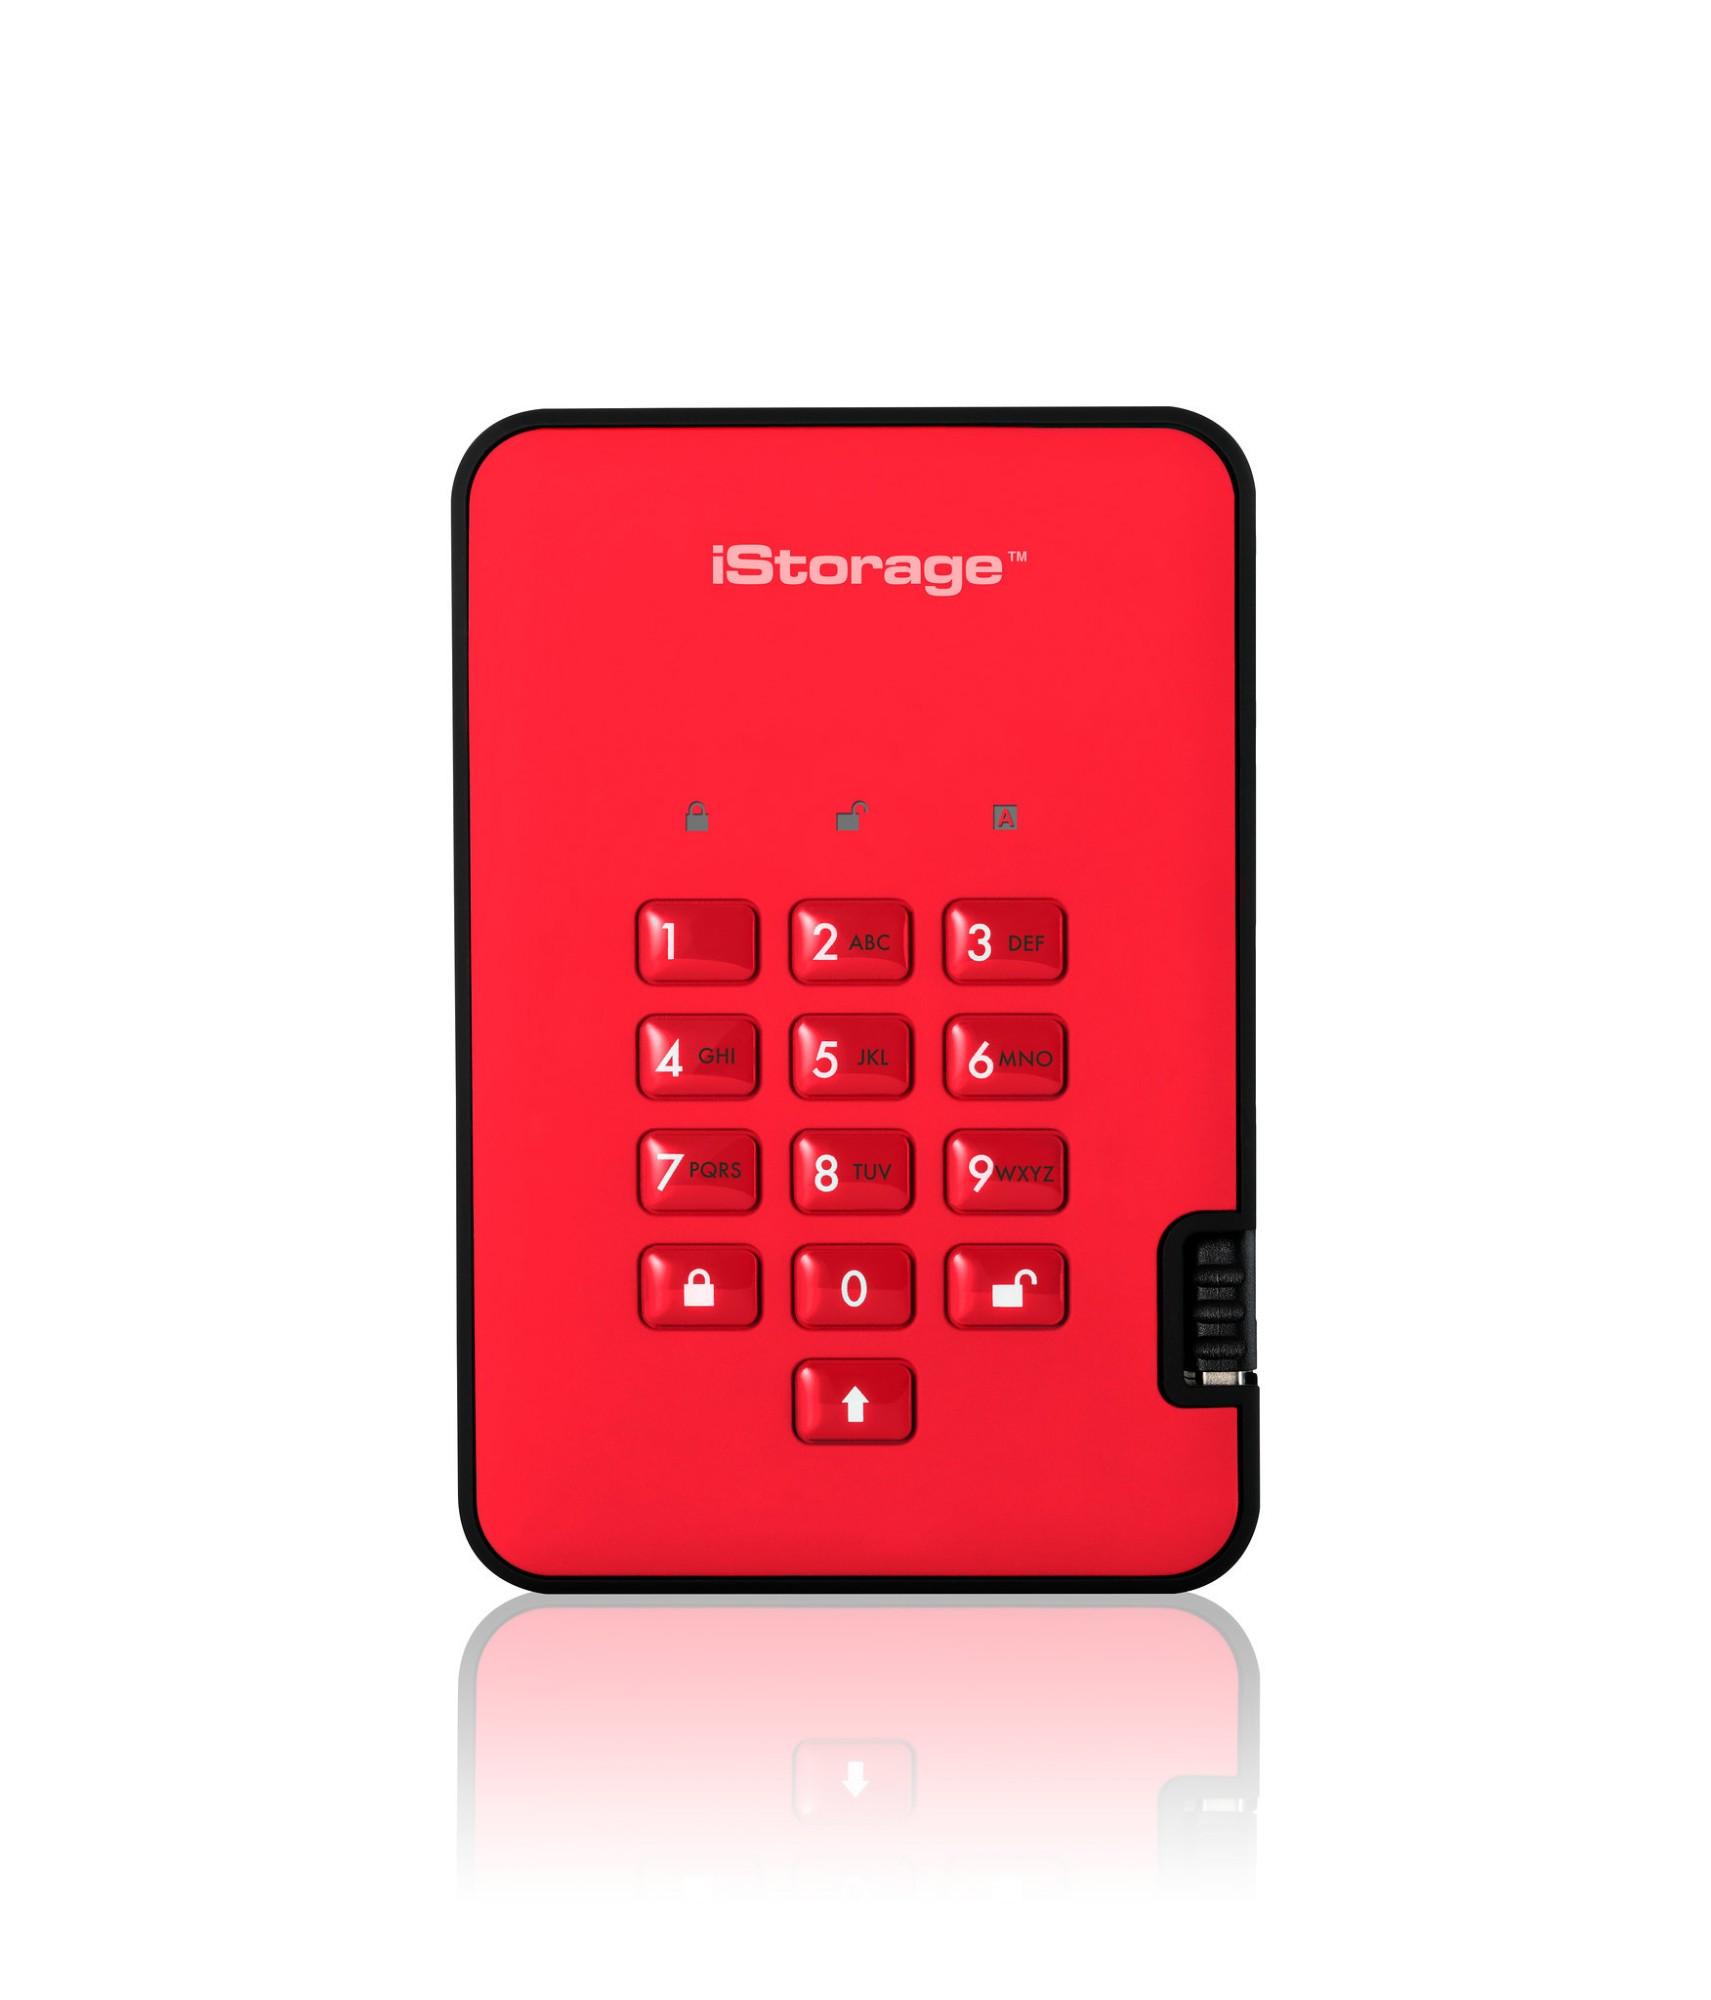 iStorage diskAshur2 256-bit 5TB USB 3.1 secure encrypted hard drive - Red IS-DA2-256-5000-R